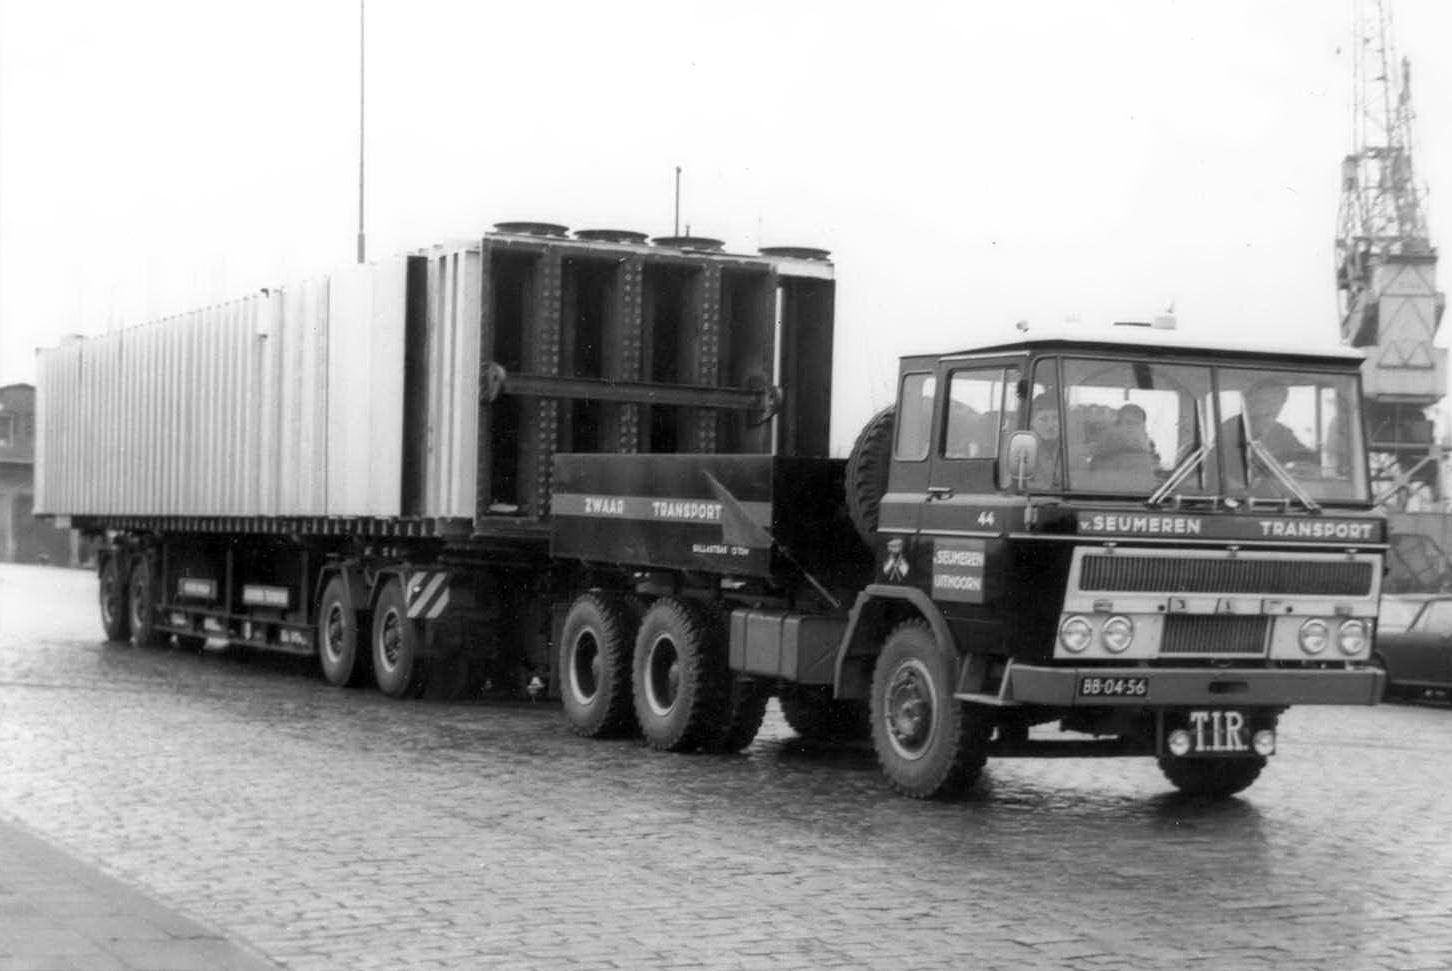 DAF-FTT2600-BB0456